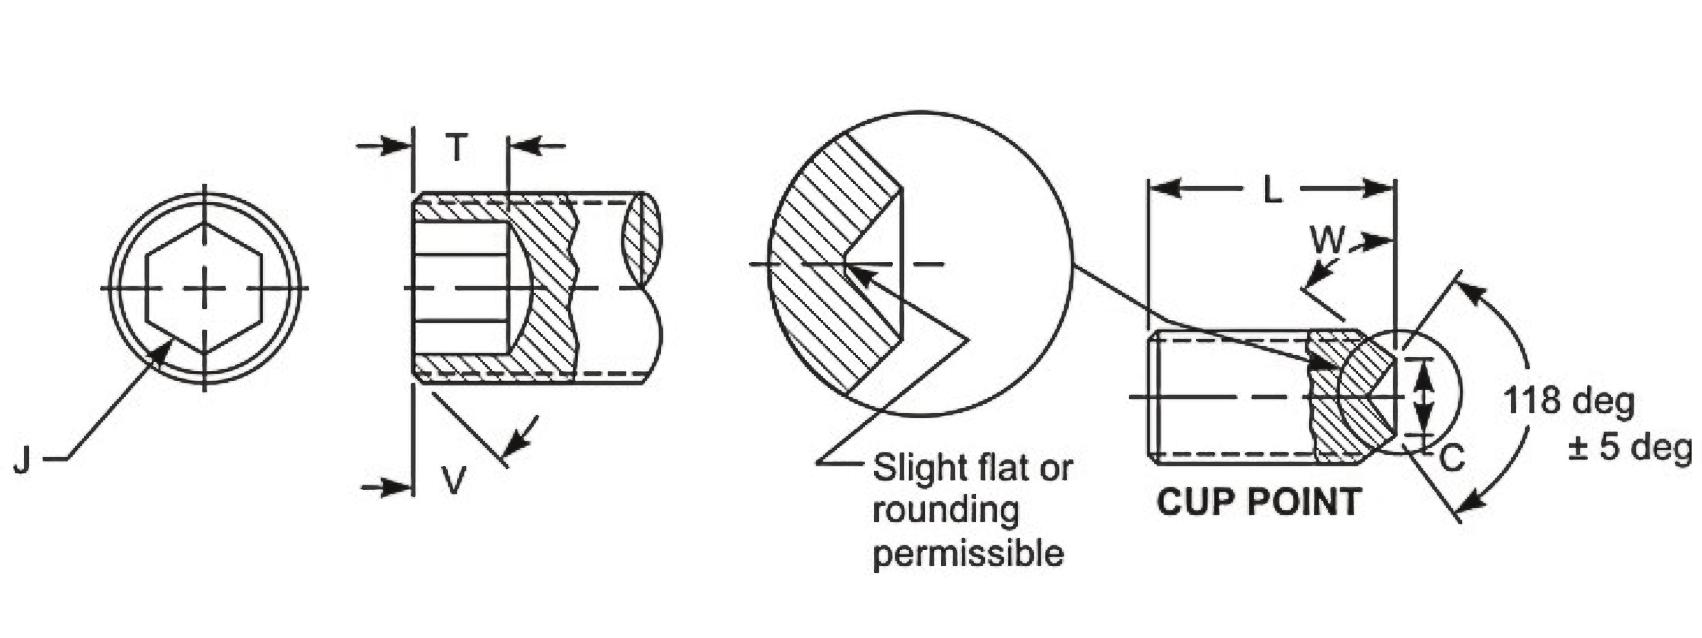 Socket Set Screw dimensions